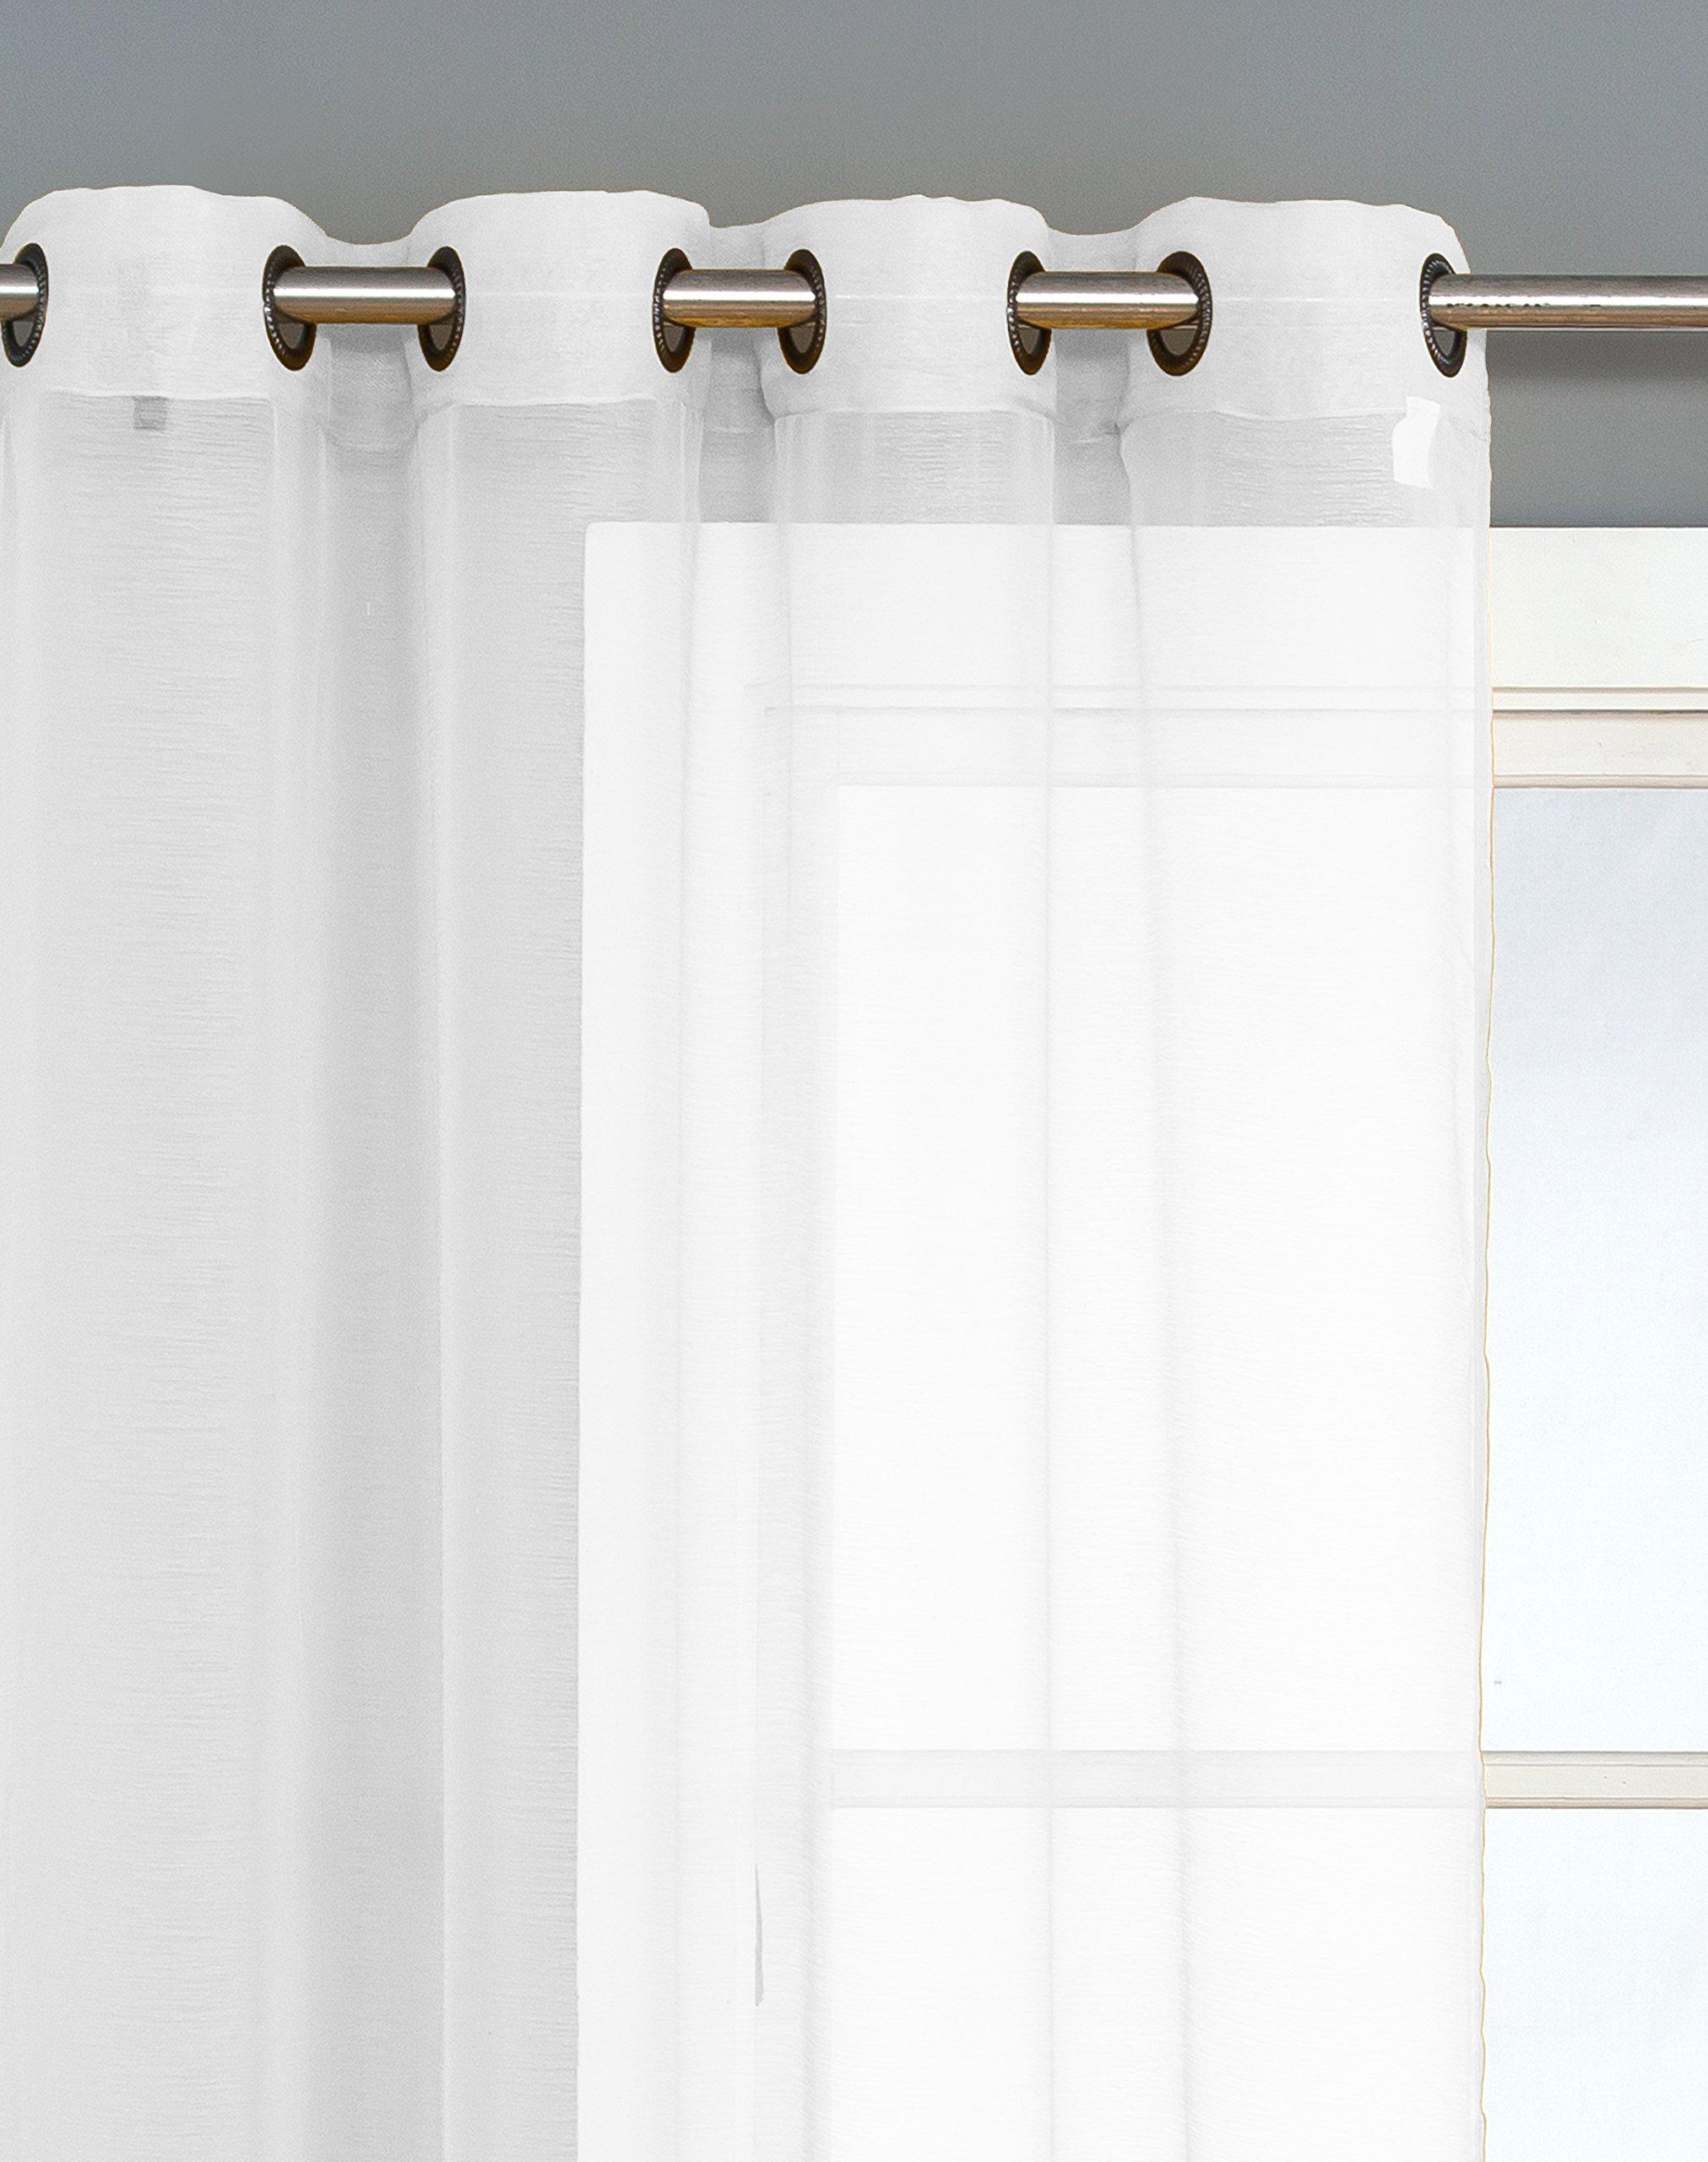 hlc me 2 piece sheer voile grommet curtain panels for bedroom white 90 inch long 2pc shr. Black Bedroom Furniture Sets. Home Design Ideas